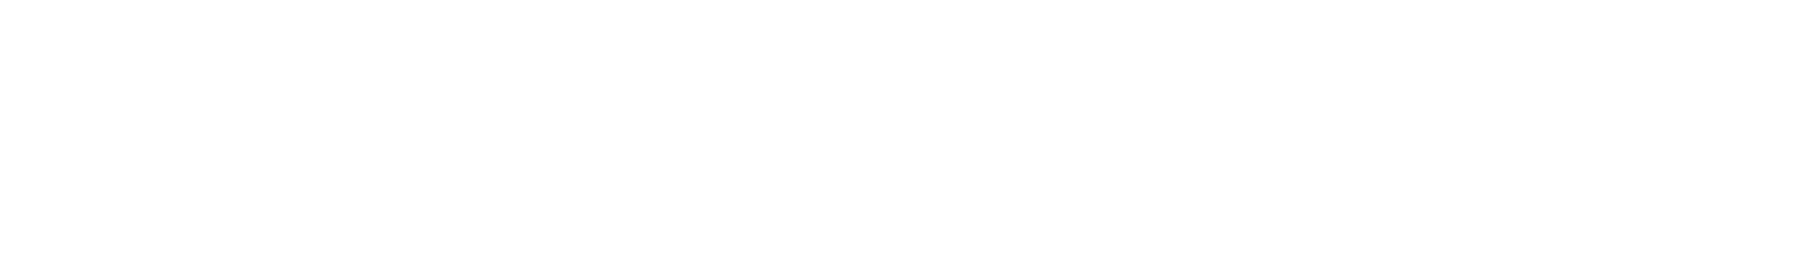 96 scratch loop 05